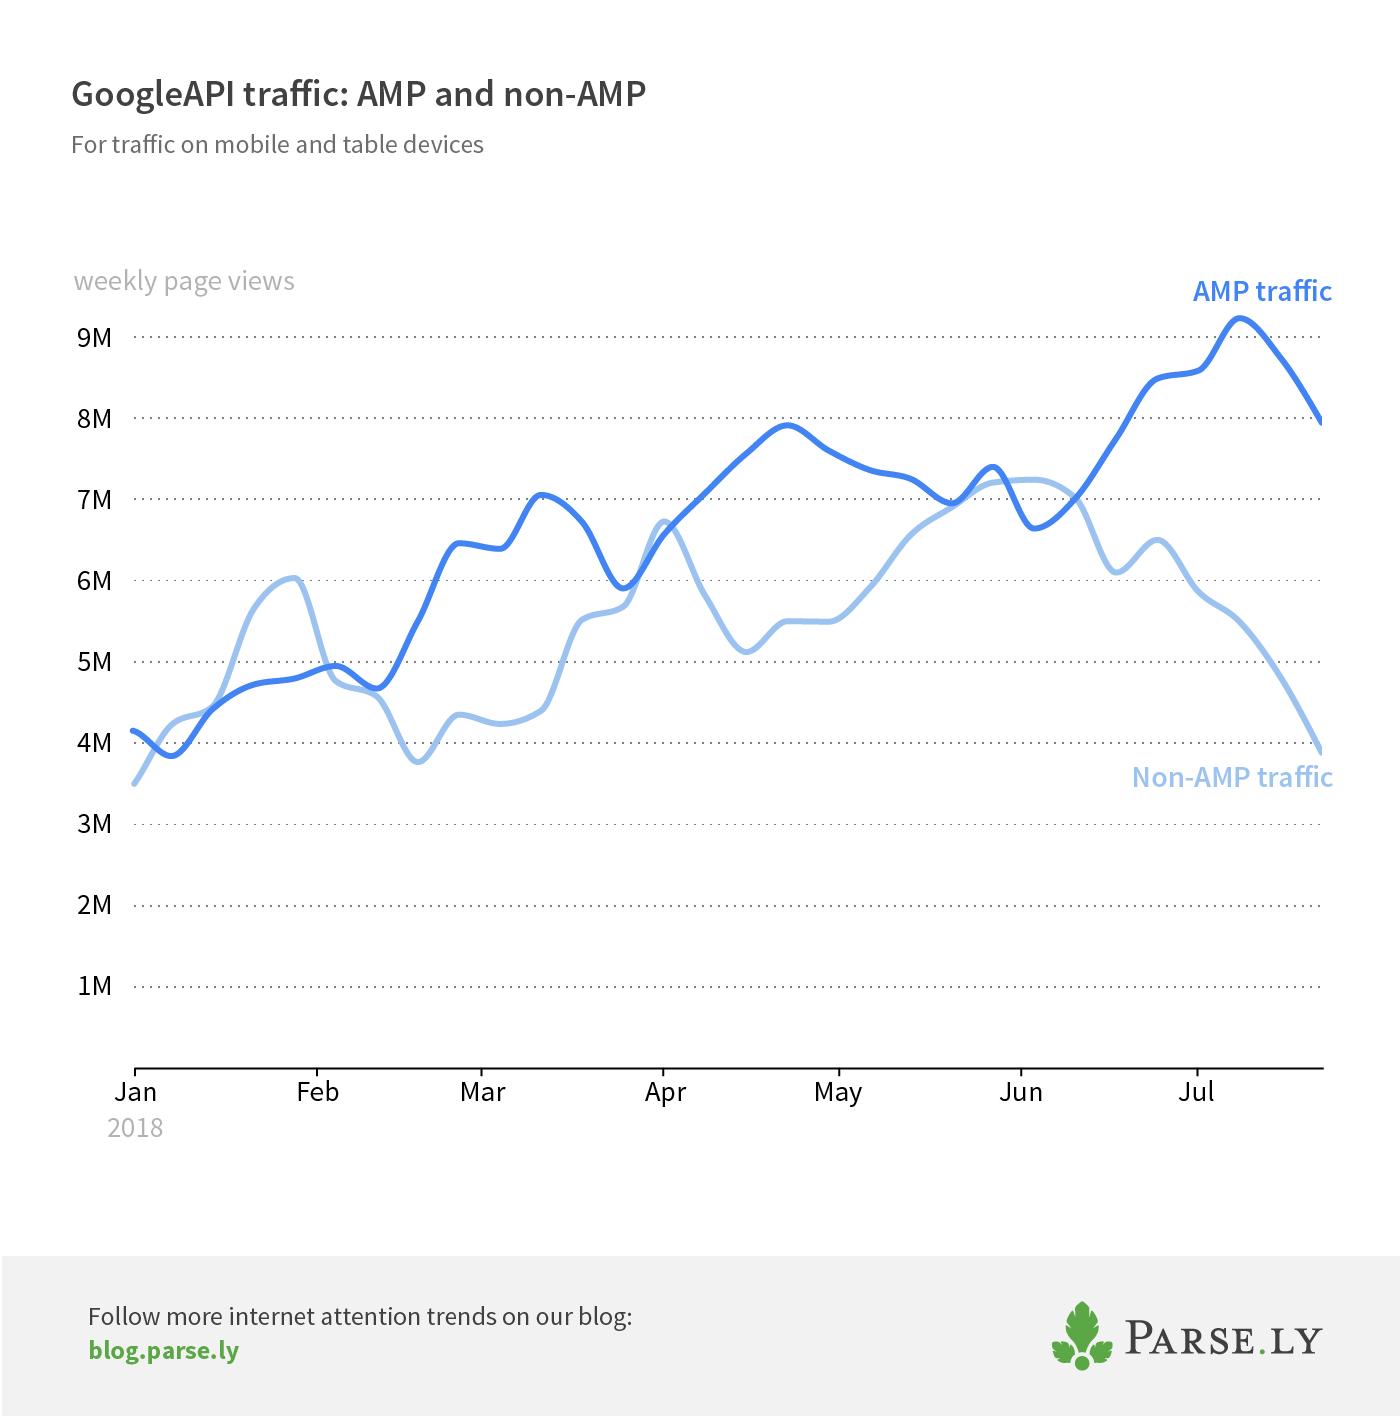 AMP and non-AMP Googleapi traffic